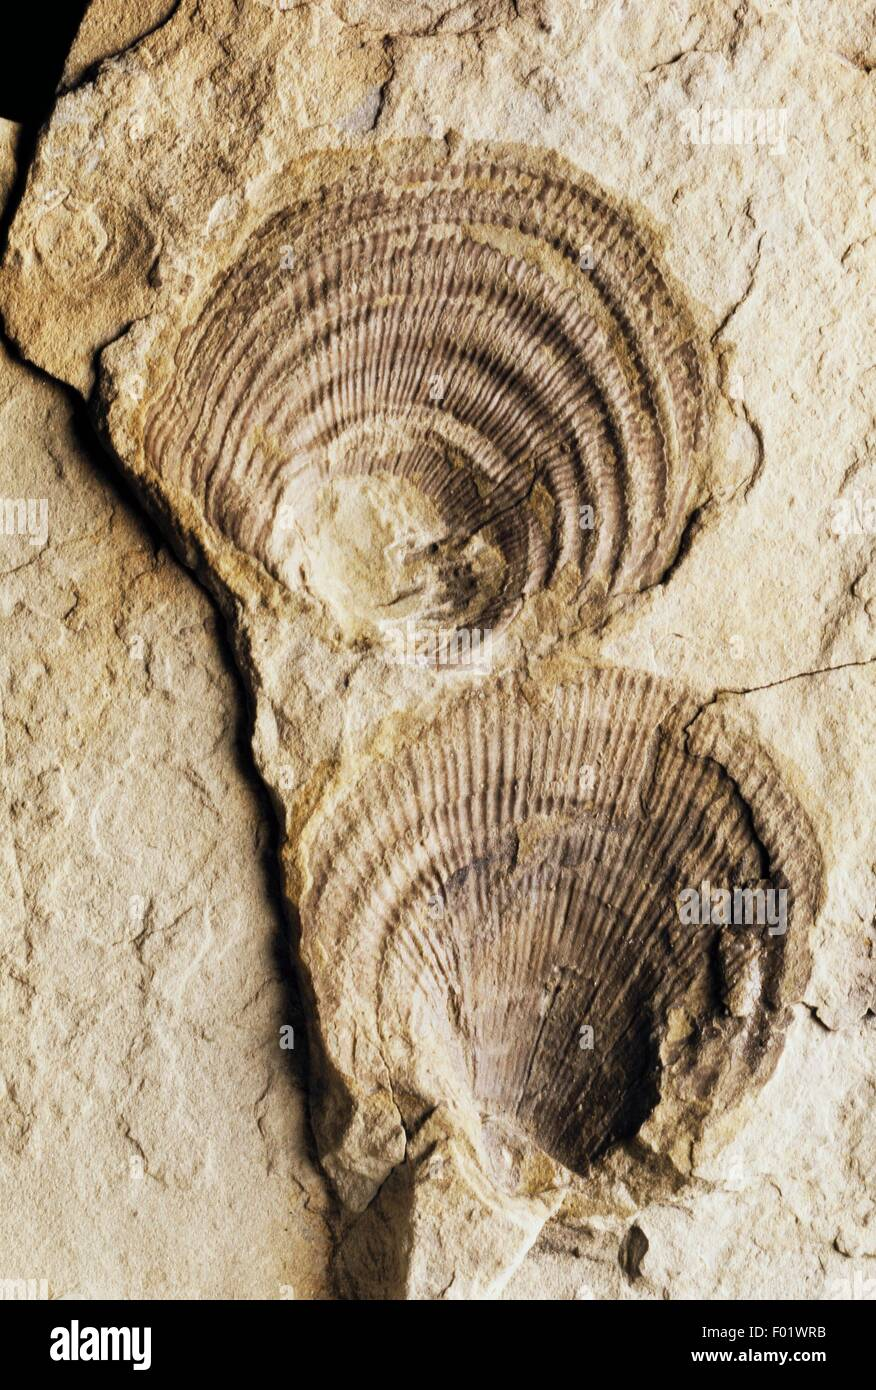 Claraia clarai fossiles, Bivalvia, Trias précoce. Photo Stock